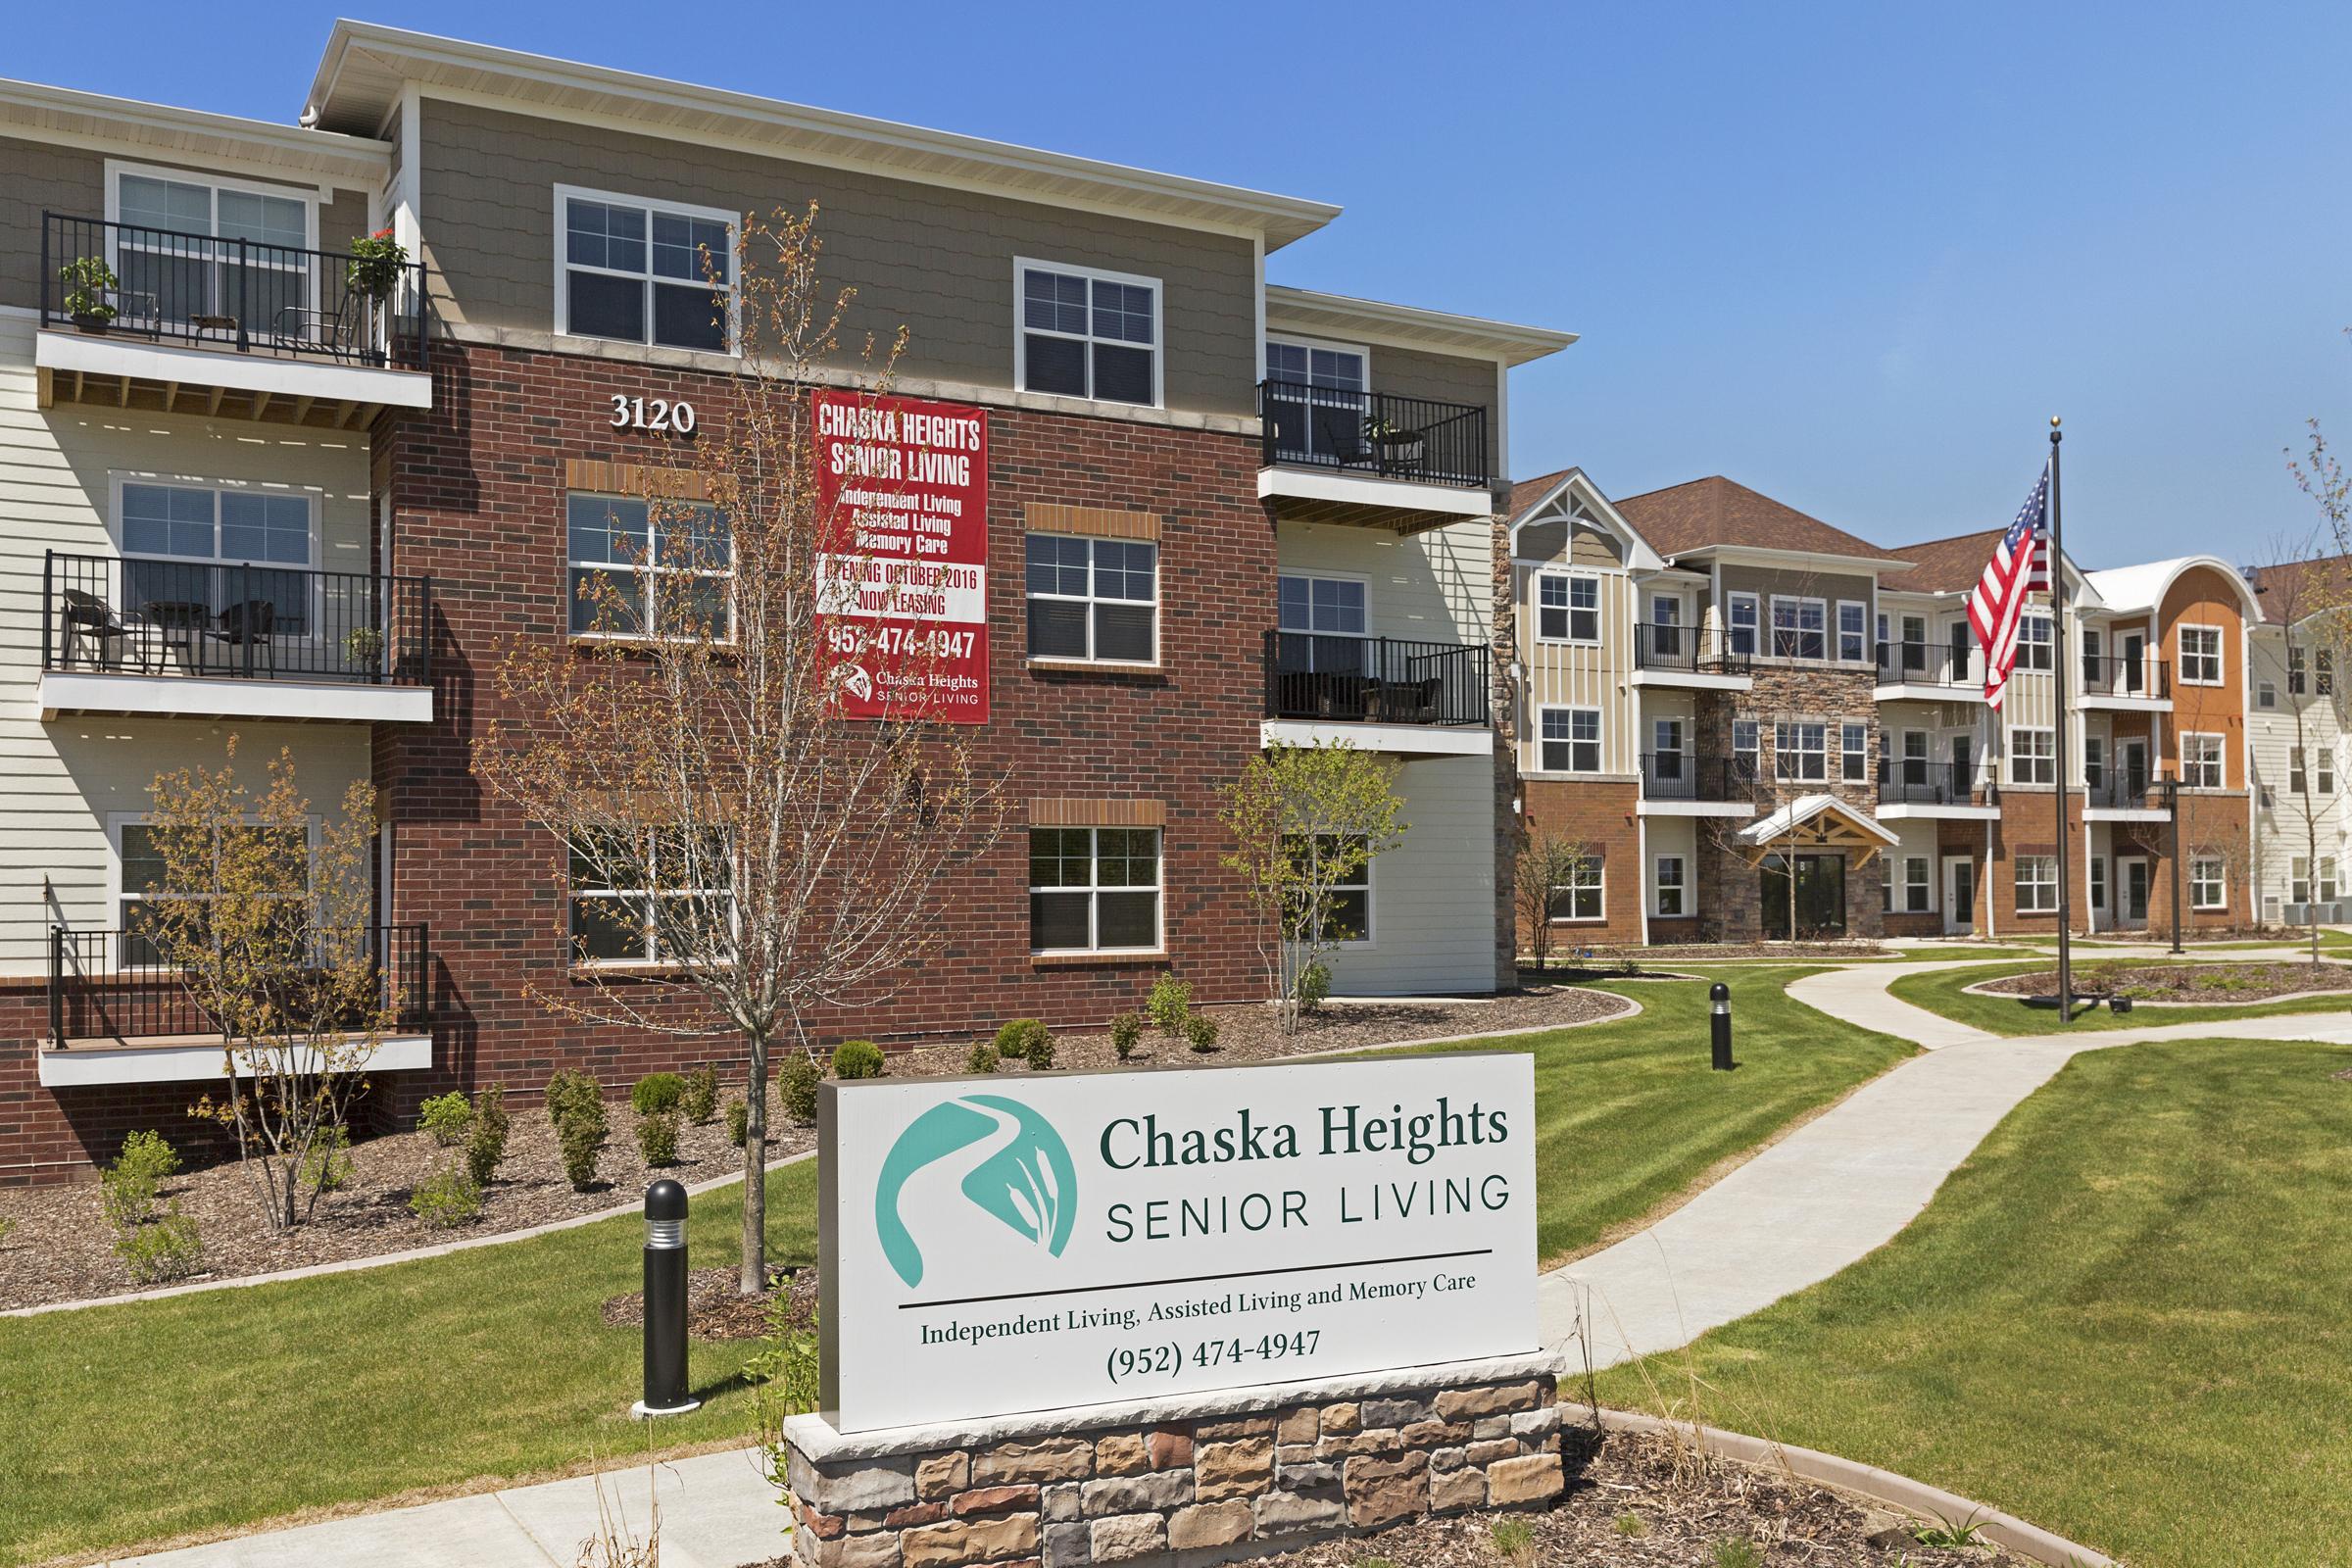 Chaska Heights_001.jpg